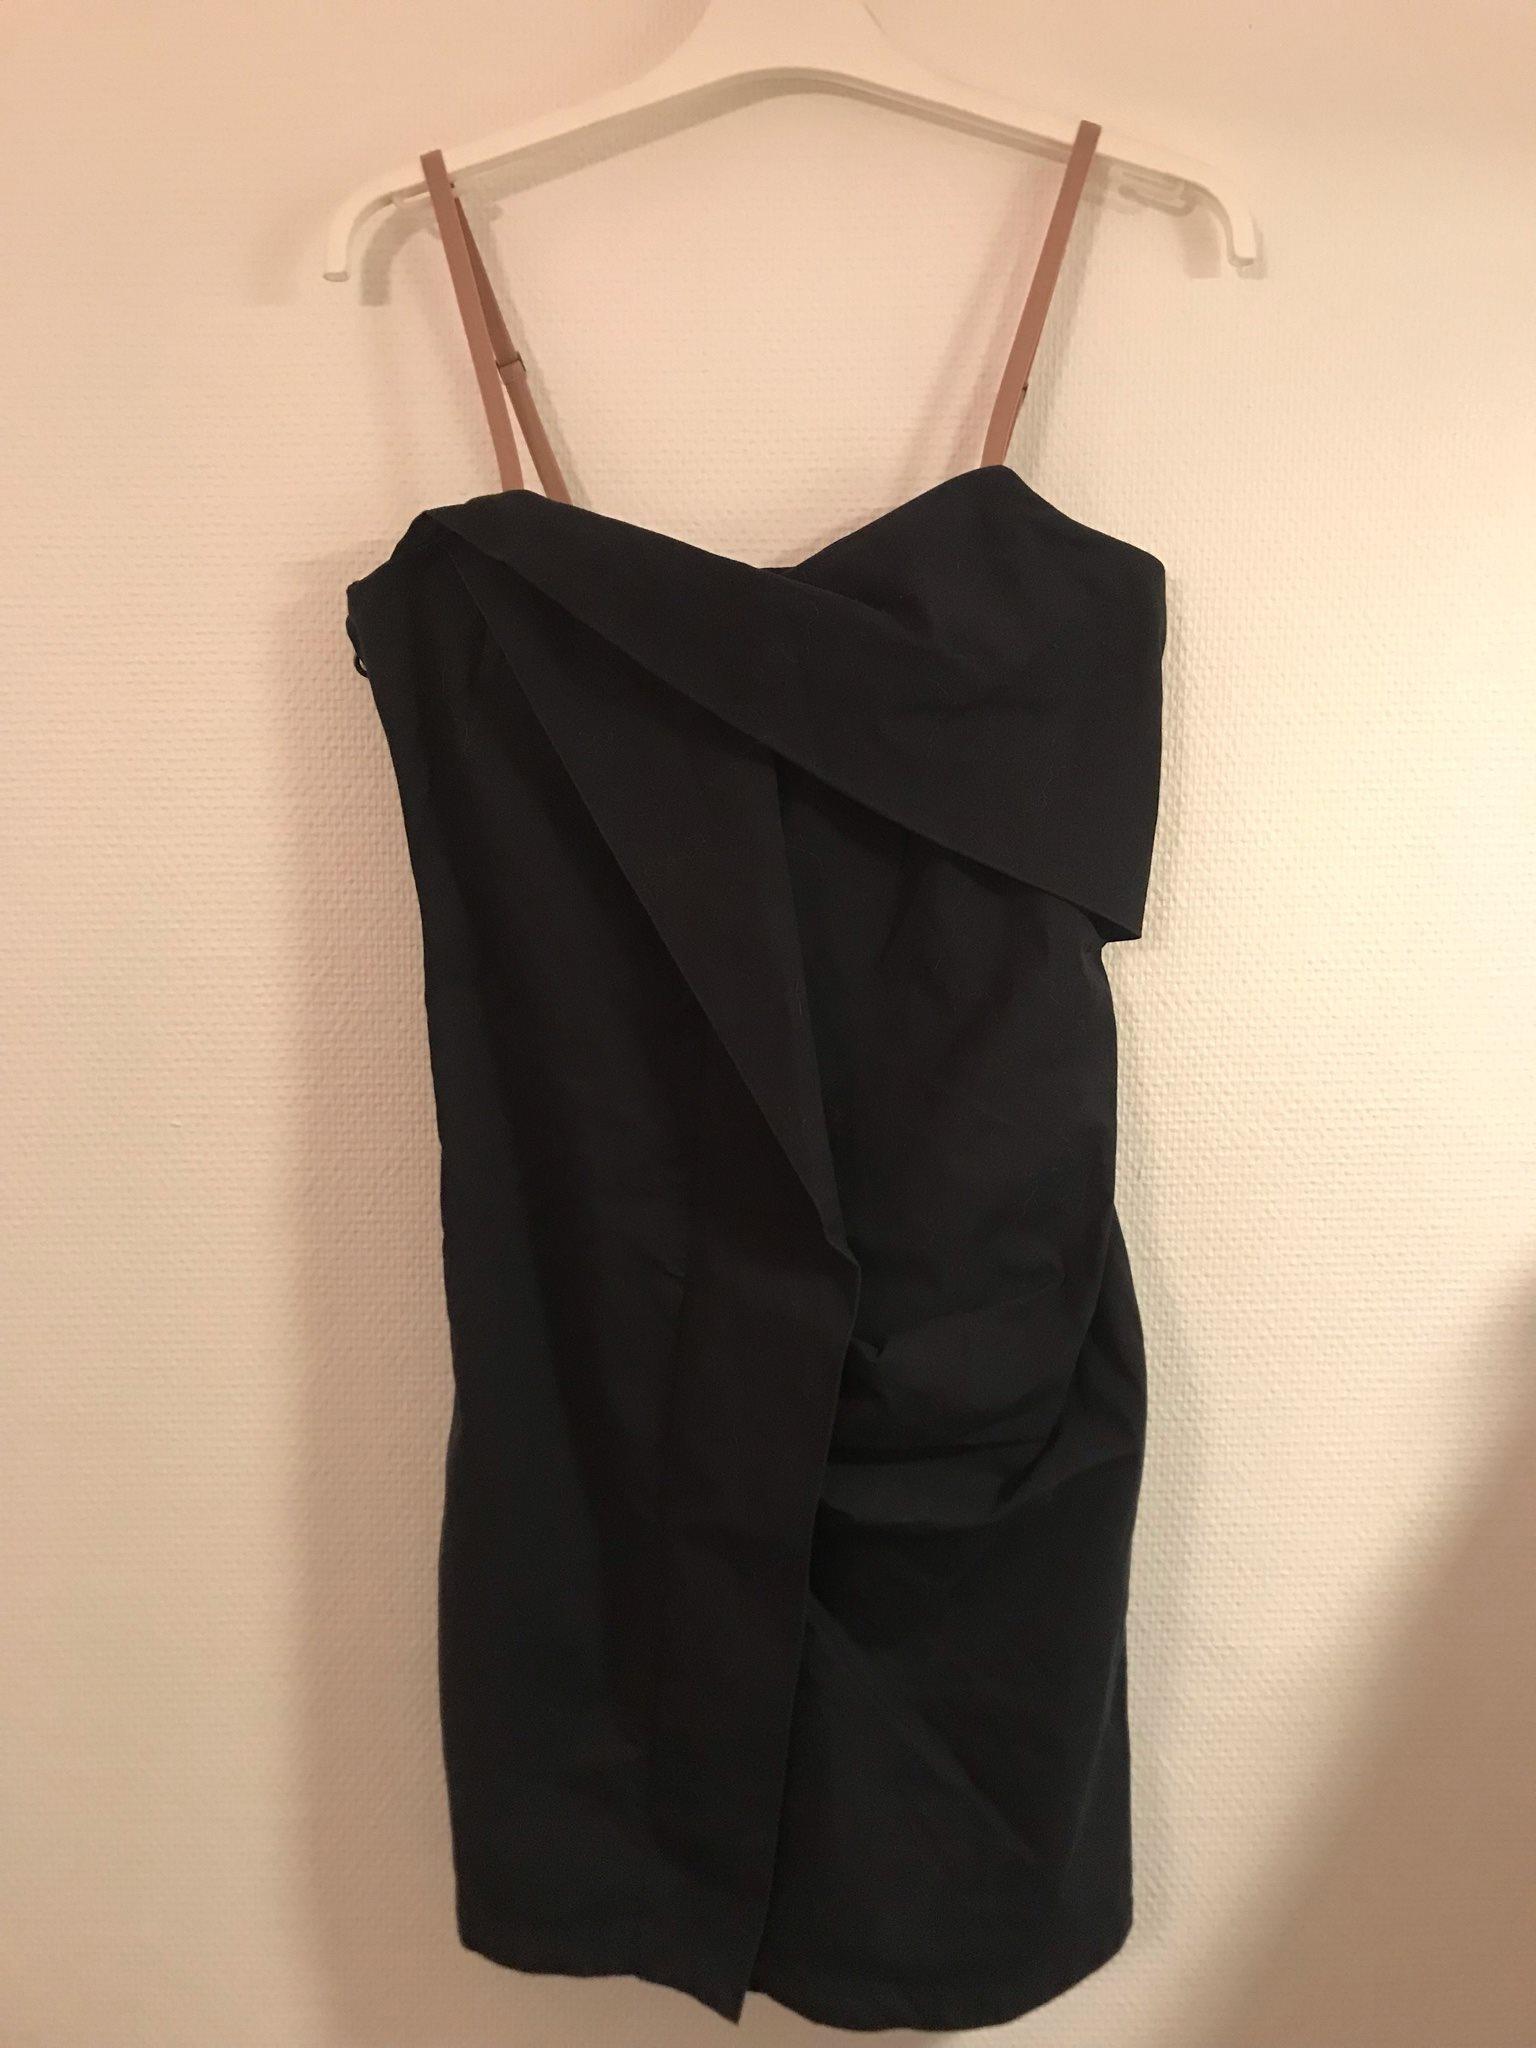 marc jacobs klänning